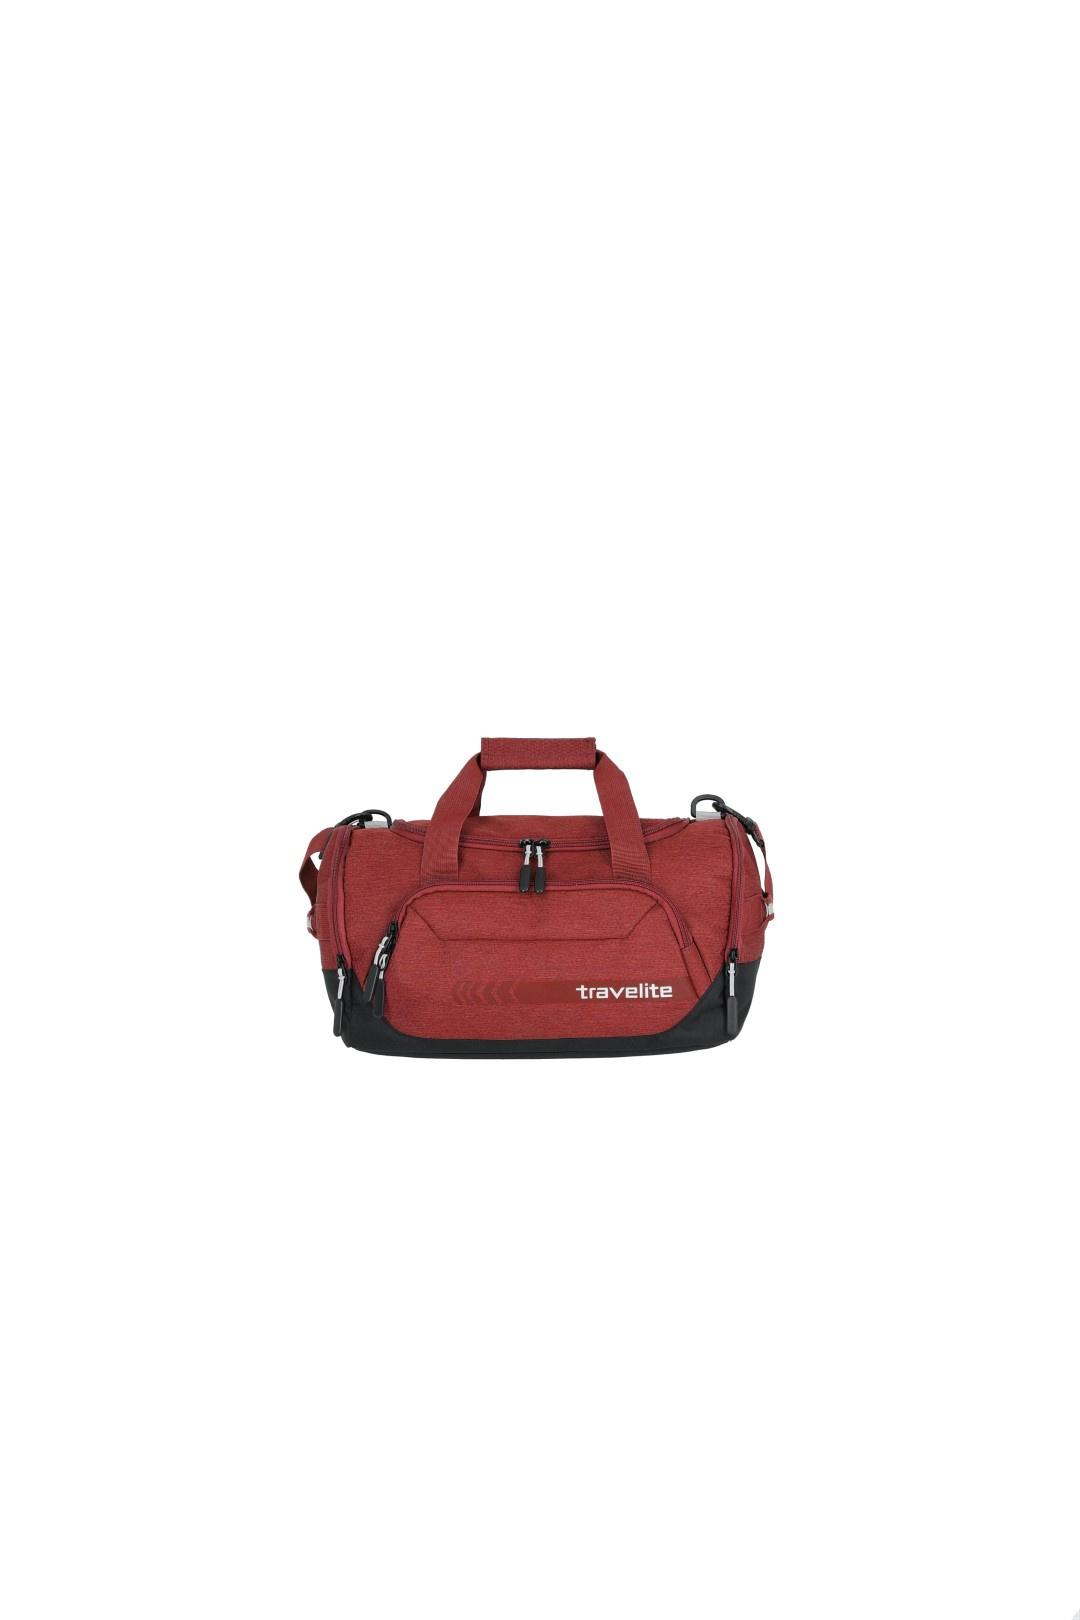 Travelite KICK OFF Duffle S 006913 Red